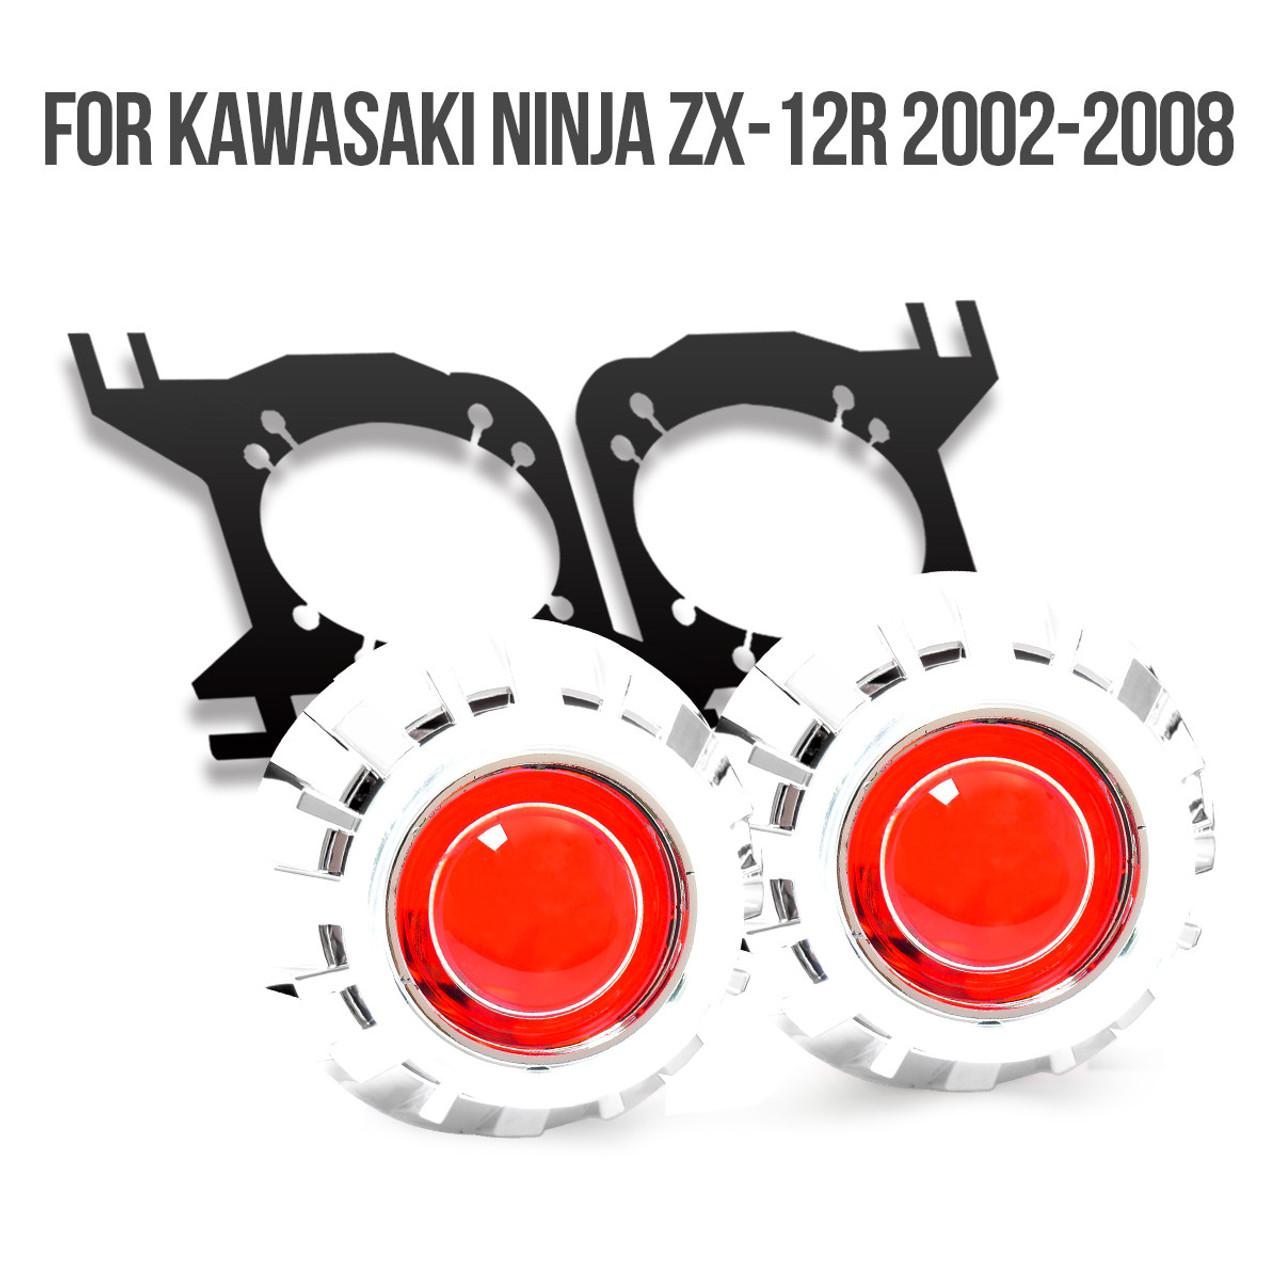 fit for kawasaki ninja zx 12r 2002 2008 tailor made hid projector kit hp35 2002 Kawasaki ZX-12R Ninja